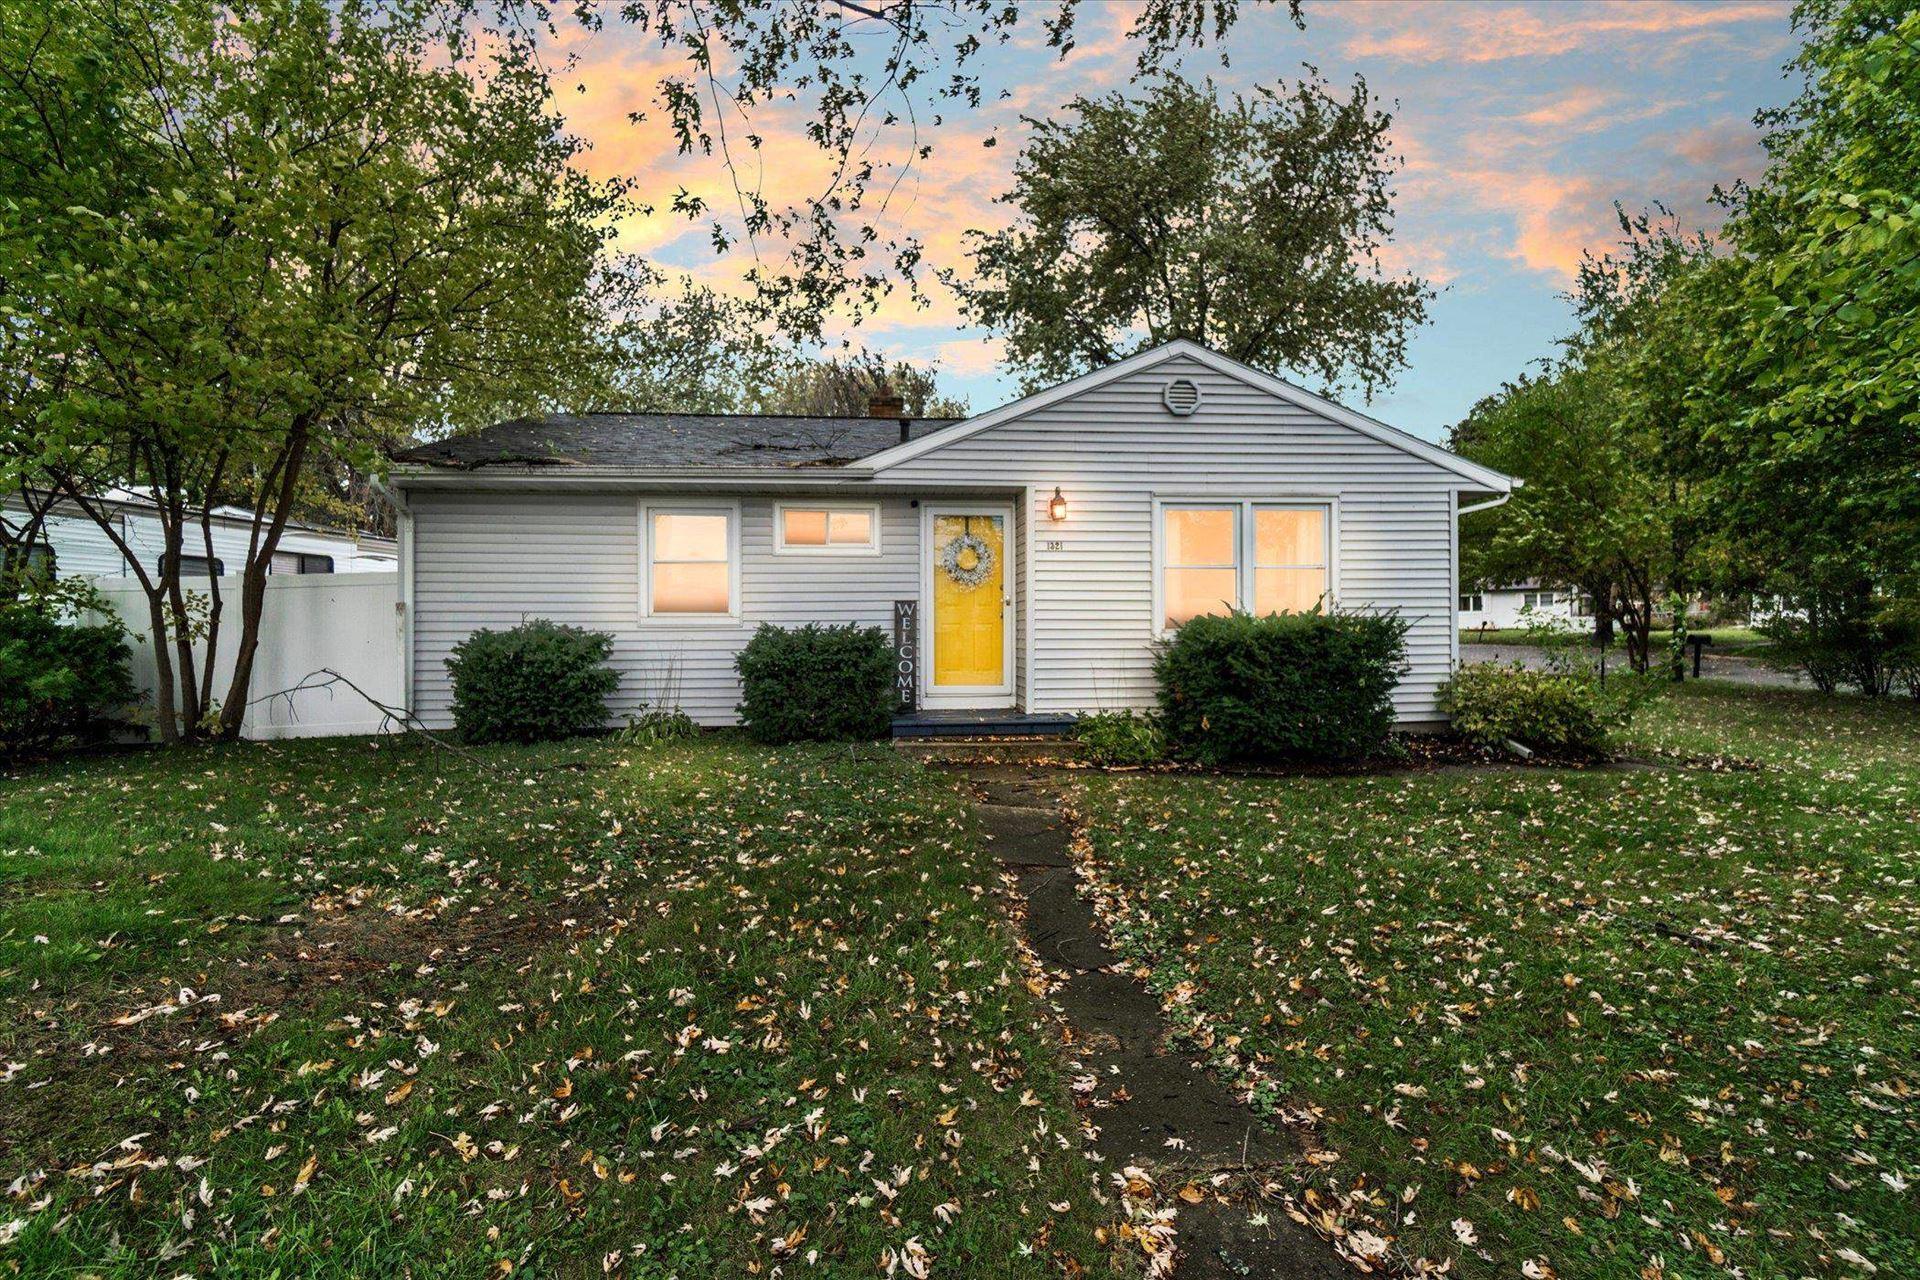 1321 Mendota St, Madison, WI 53714 - #: 1921710